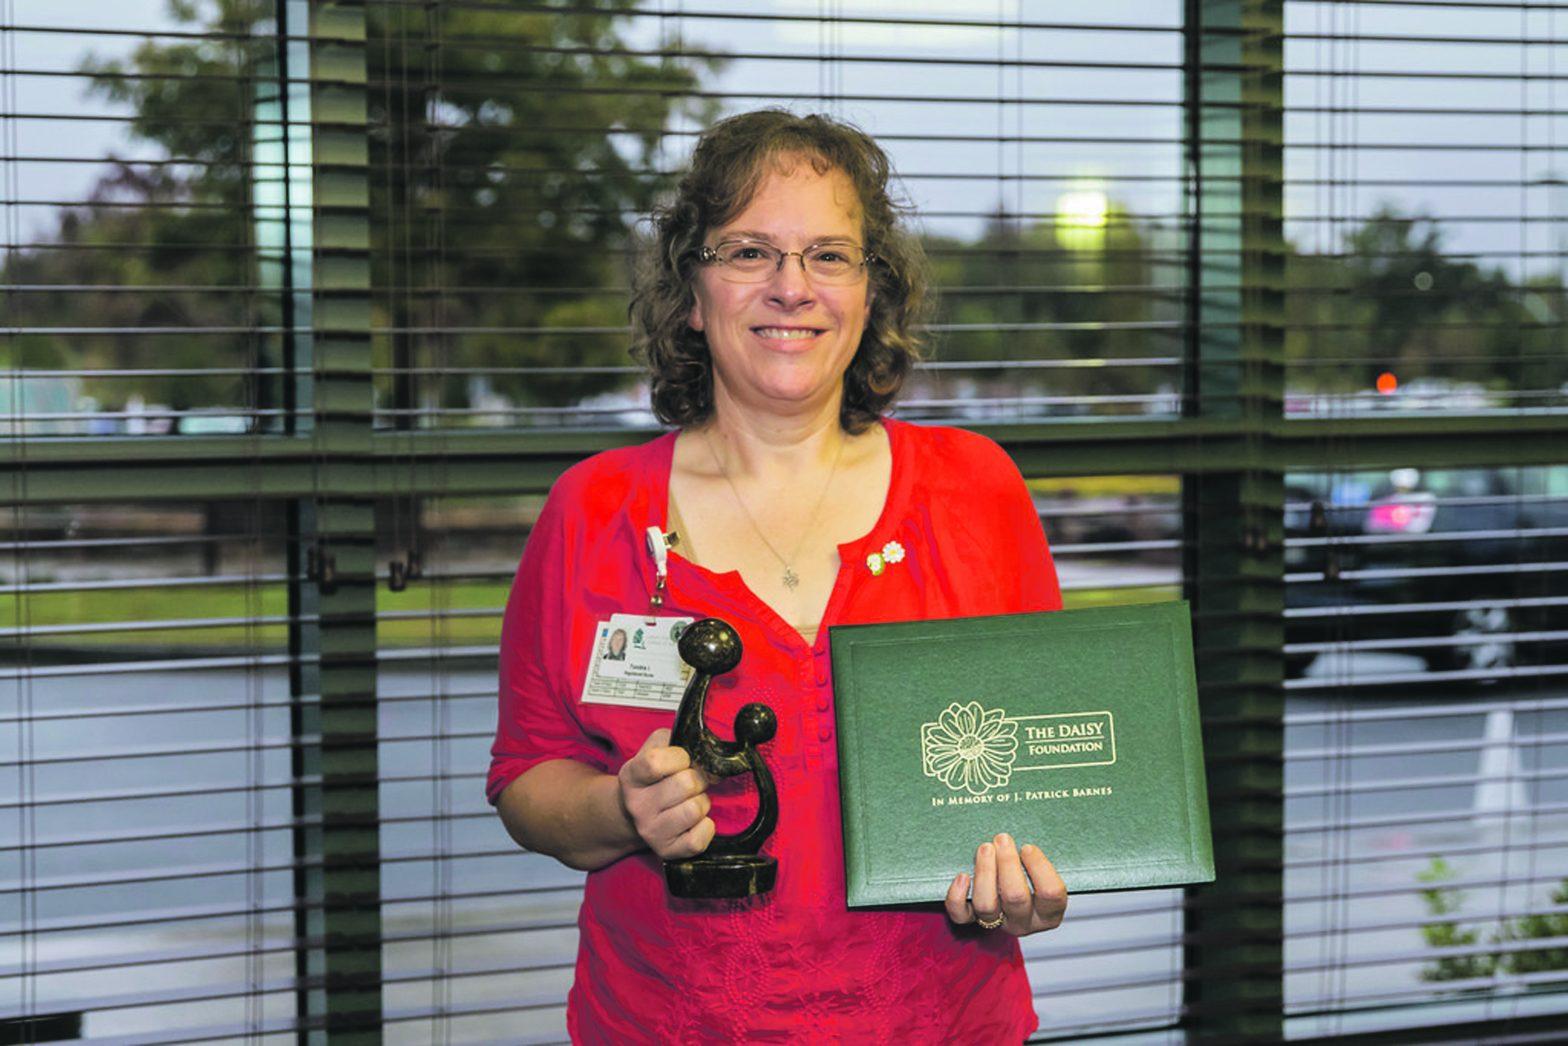 Local Nurse Awarded The DAISY  Award For Extraordinary Nurses